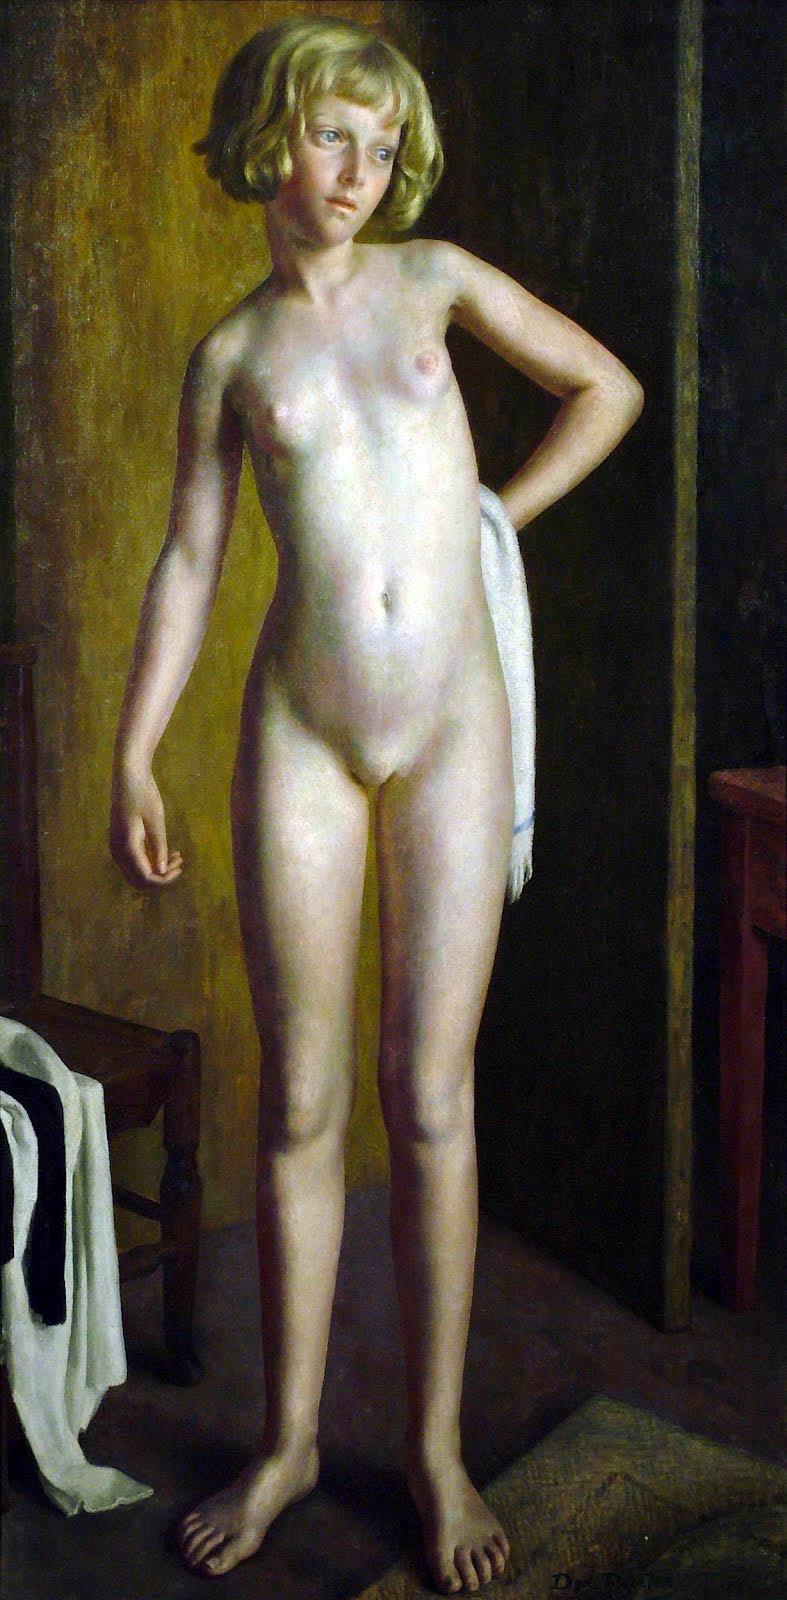 MILF junior nudes galerie girl, nice